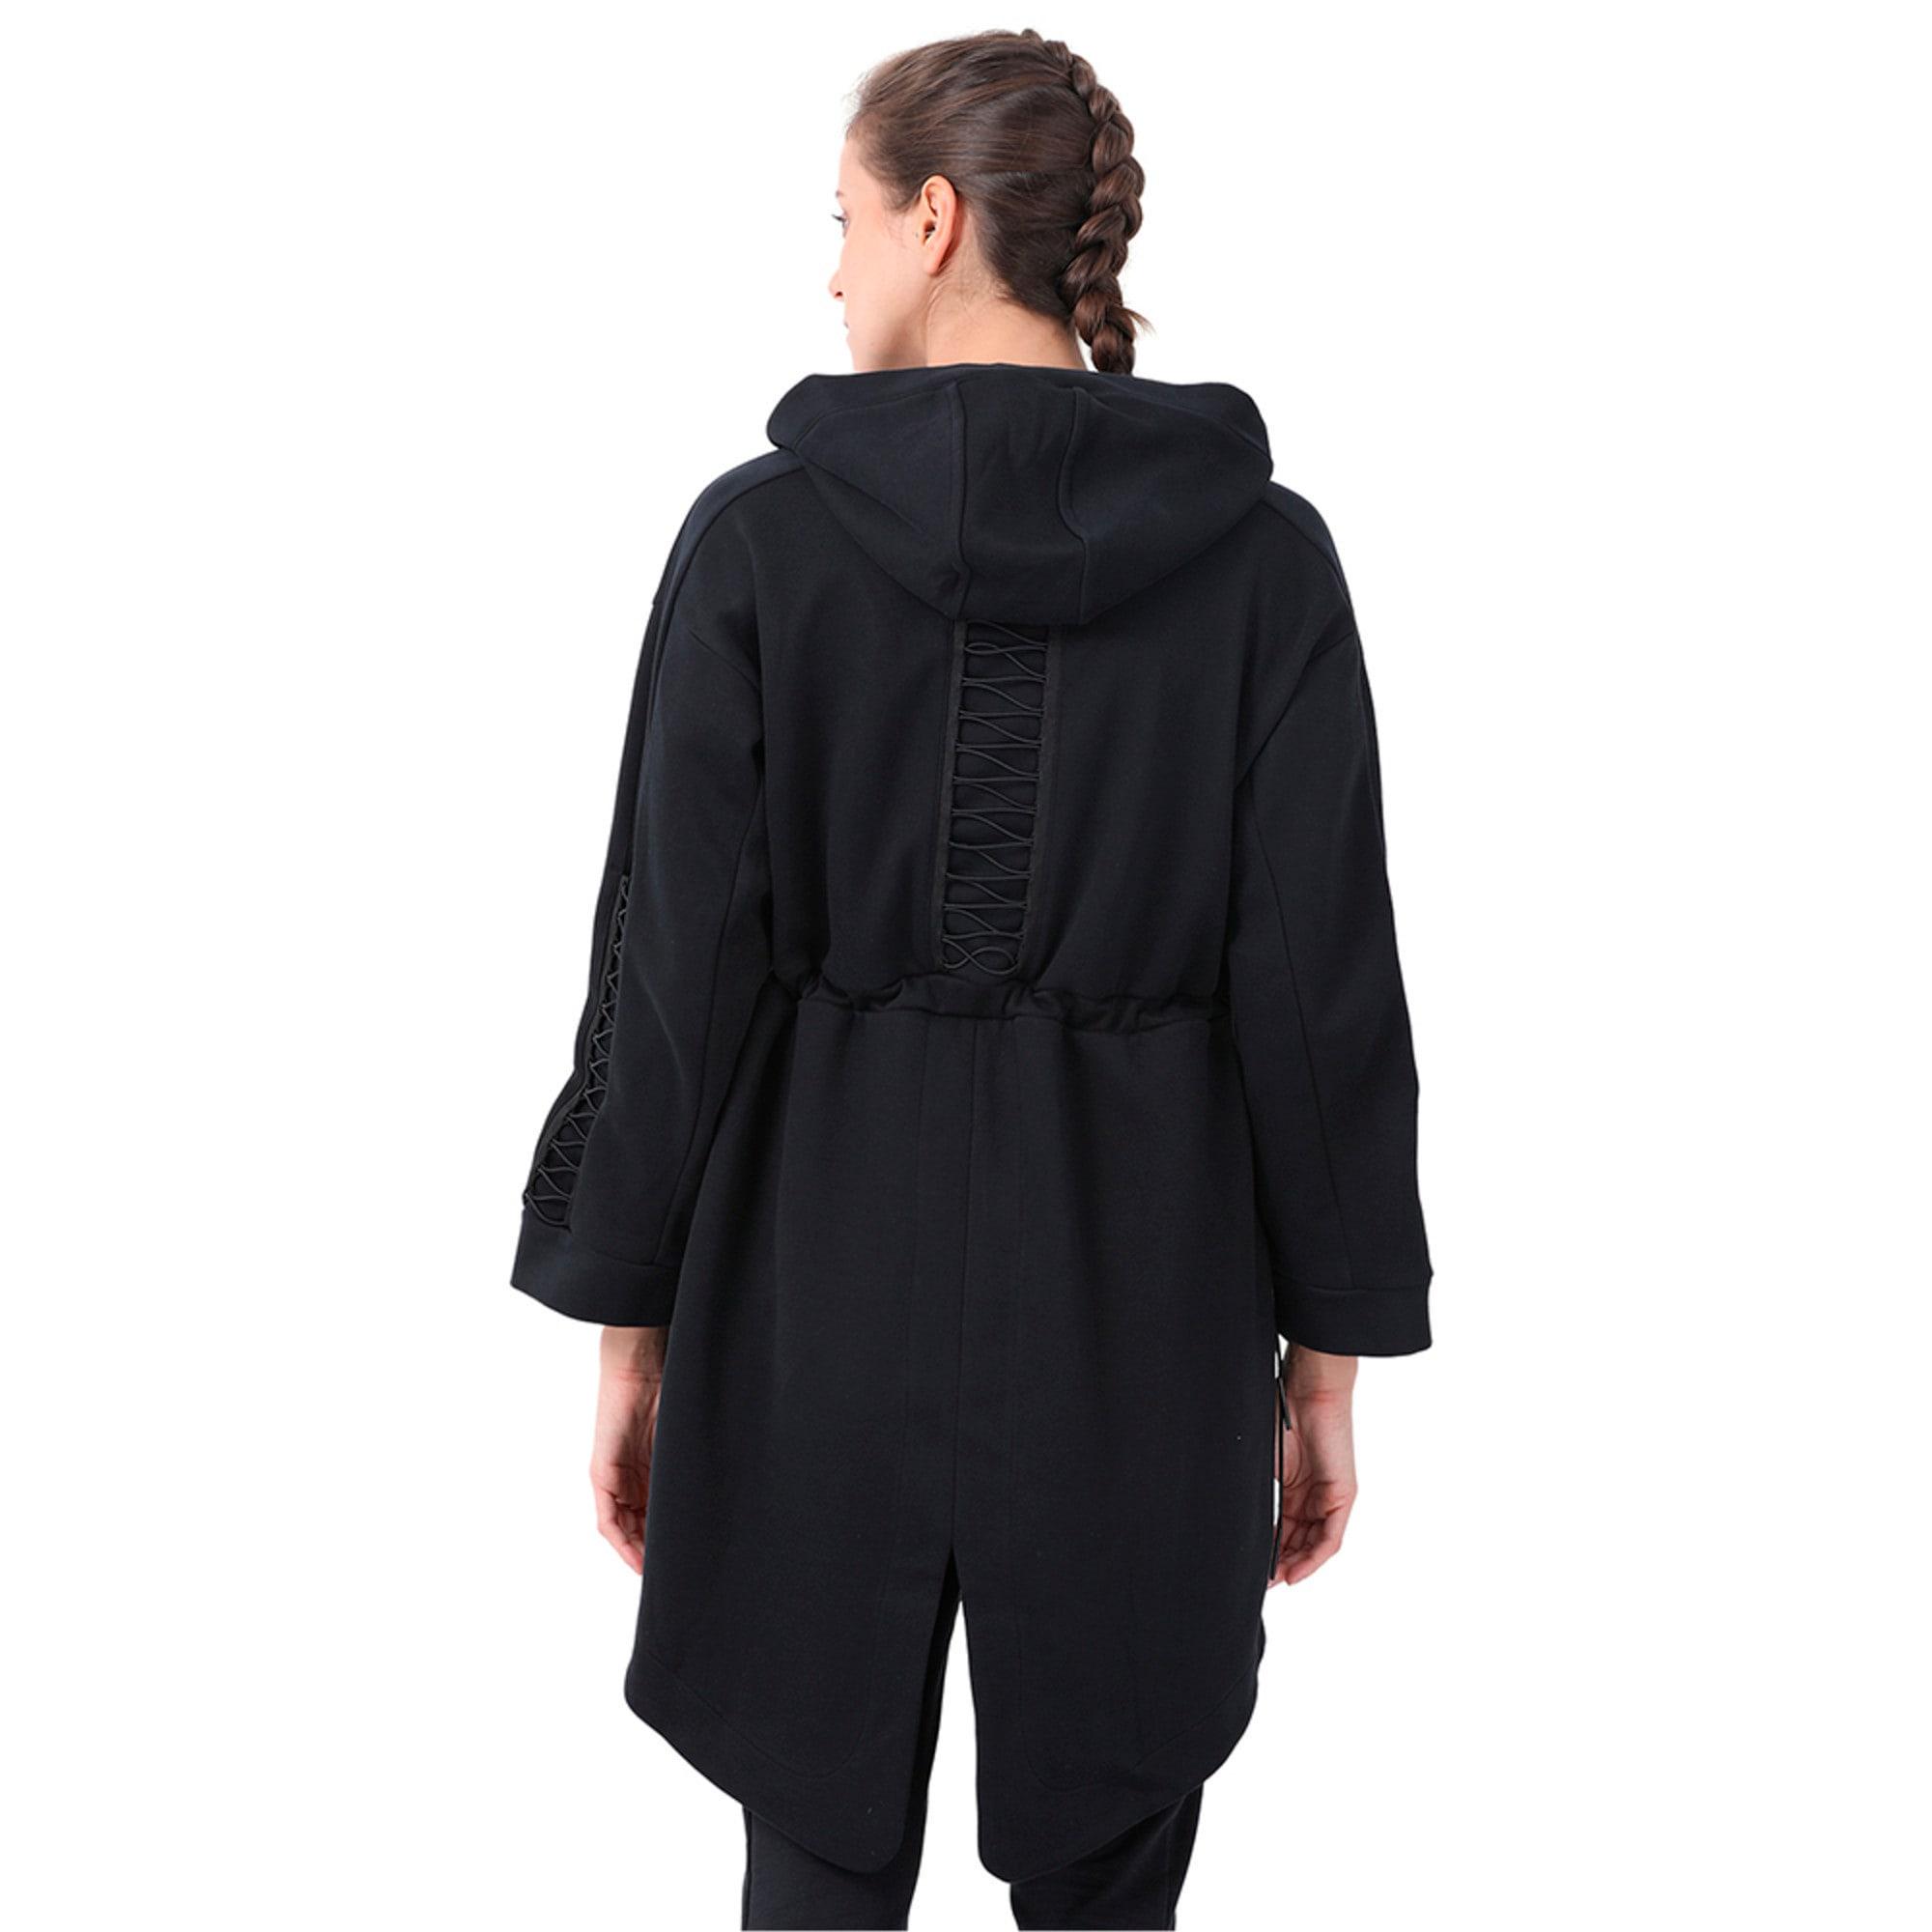 Thumbnail 2 of Evolution Women's Lacing Midlayer Jacket, Puma Black, medium-IND